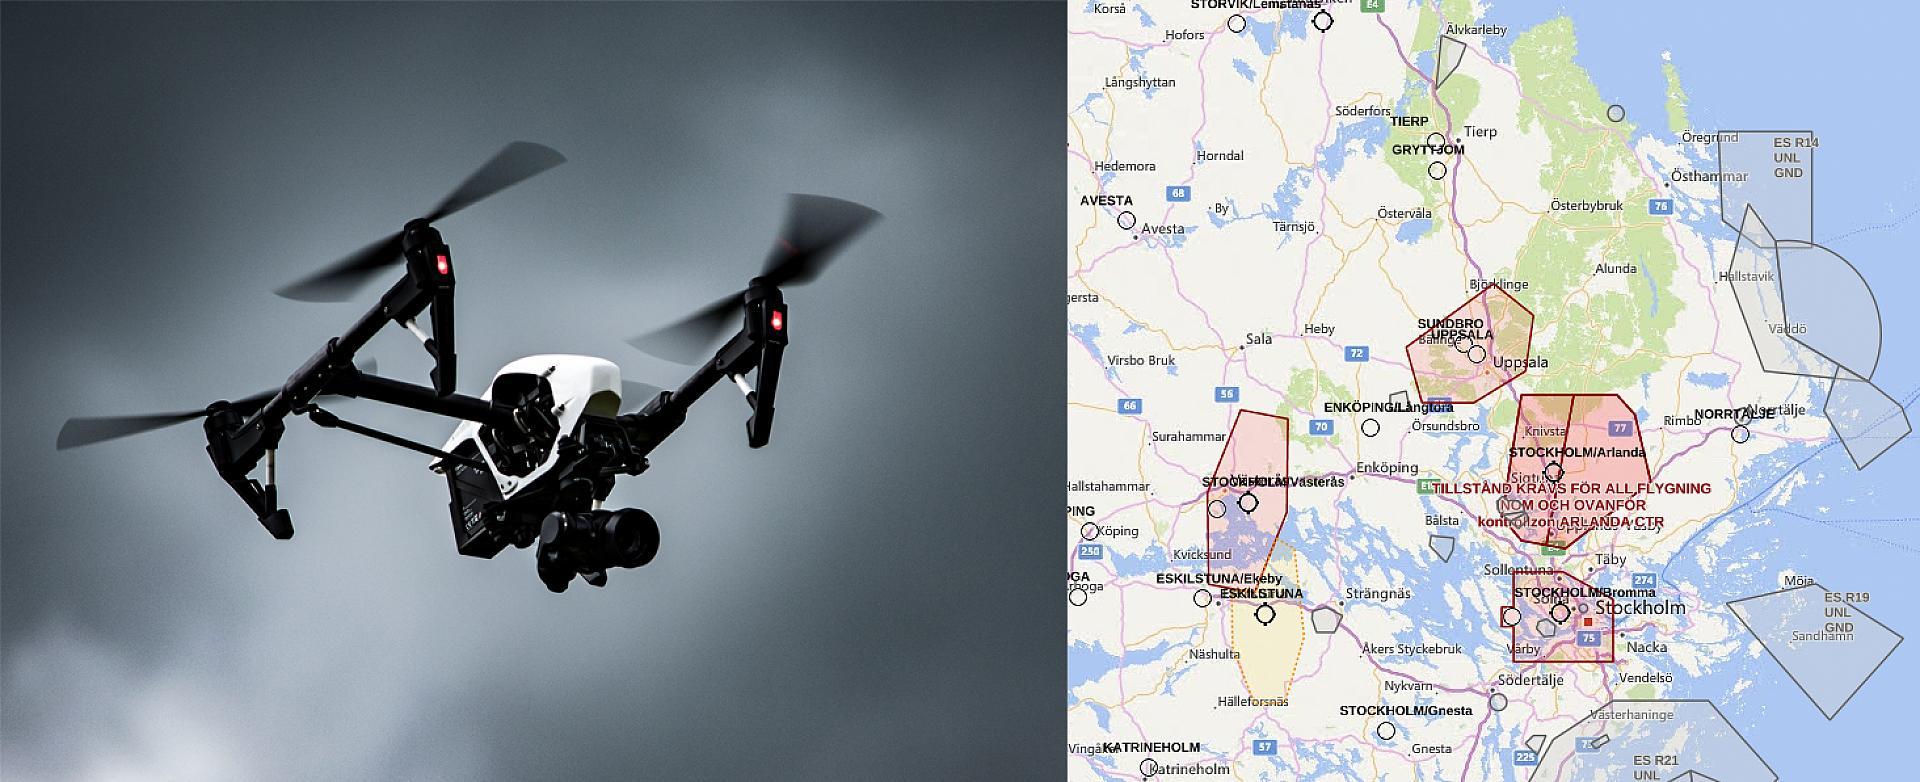 Rekordmanga incidenter med dronare